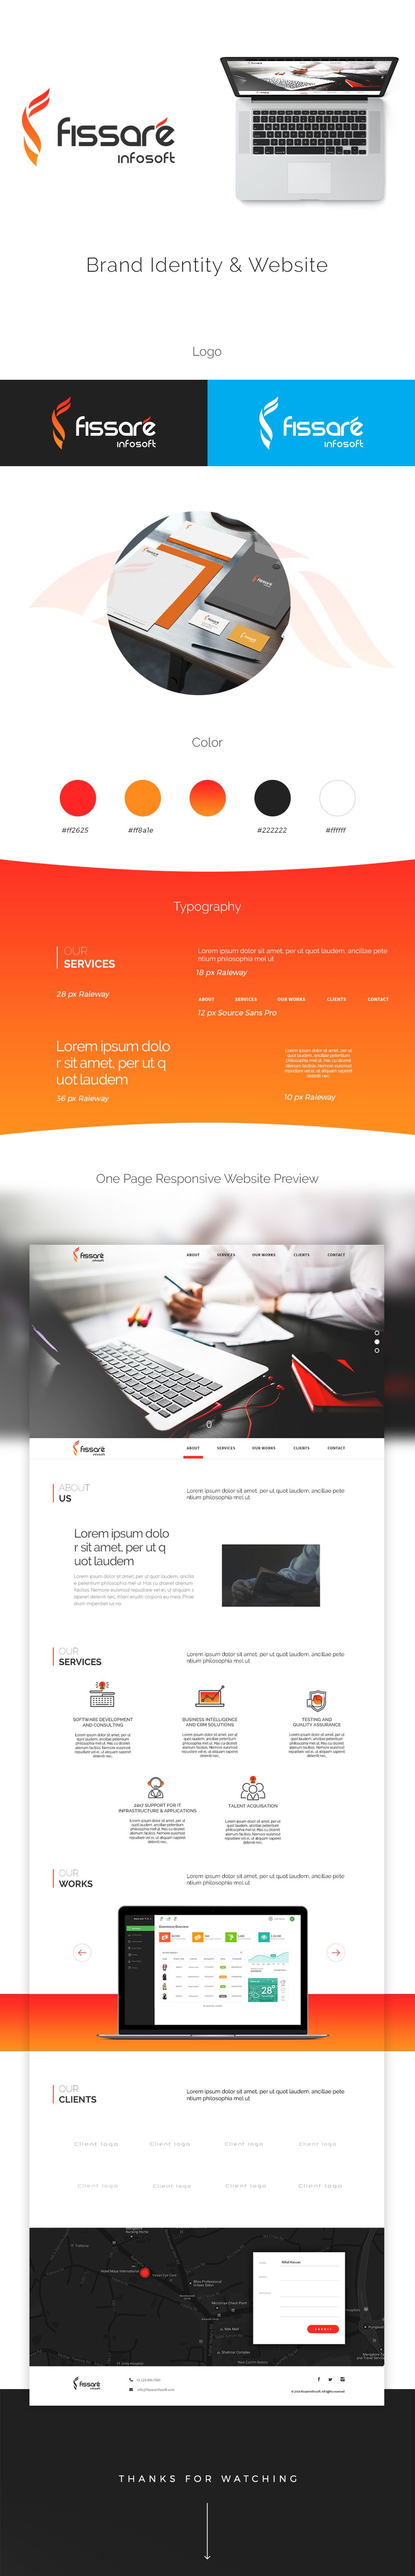 Check Out My Behance Project Fissare Infosoft Corporate Branding Website Design Https Www Behance N Branding Website Design Website Branding Branding